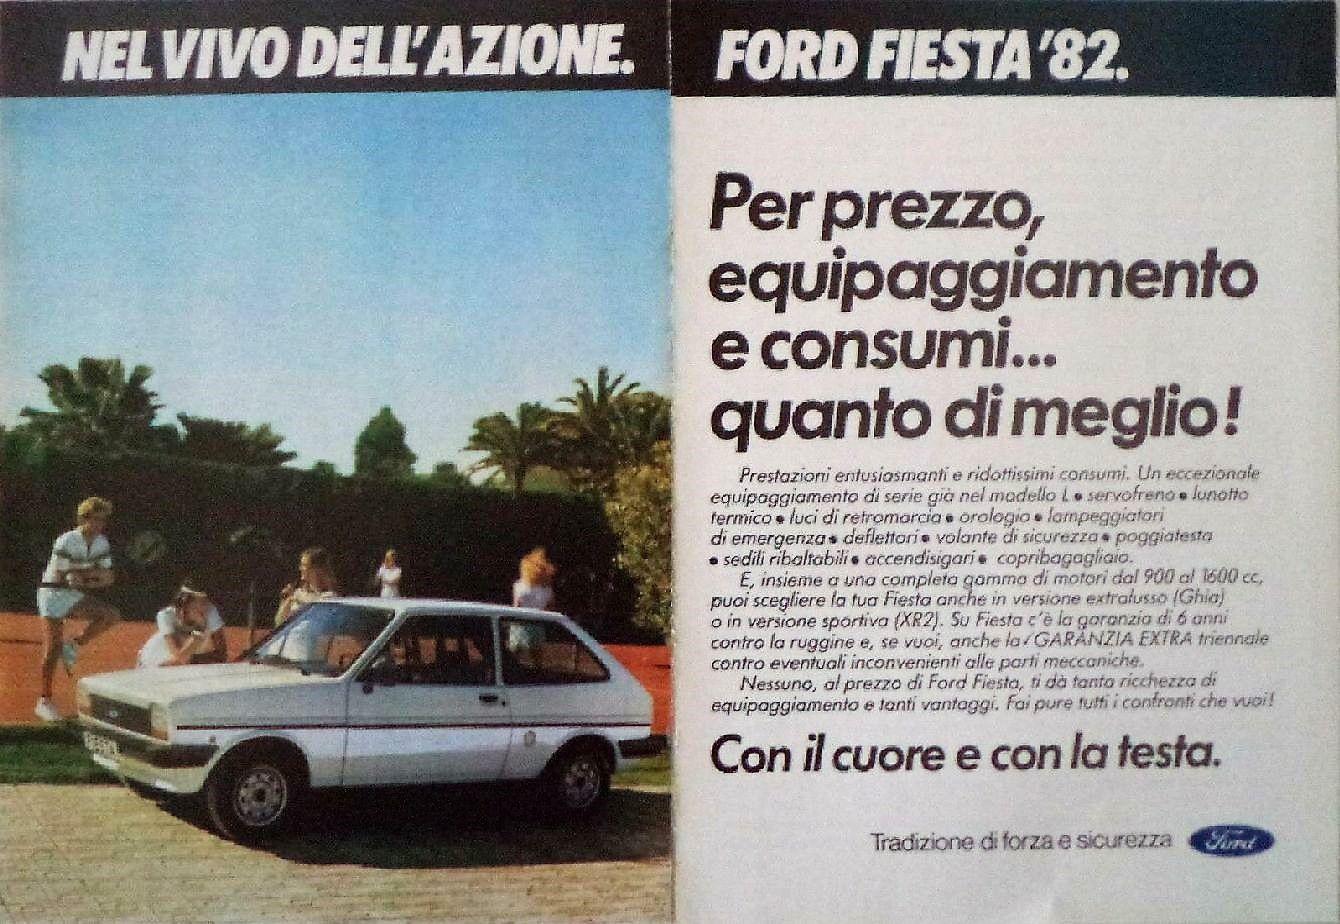 Publicidad Ford Fiesta Italiana Ford Fiesta Fiesta Italiana